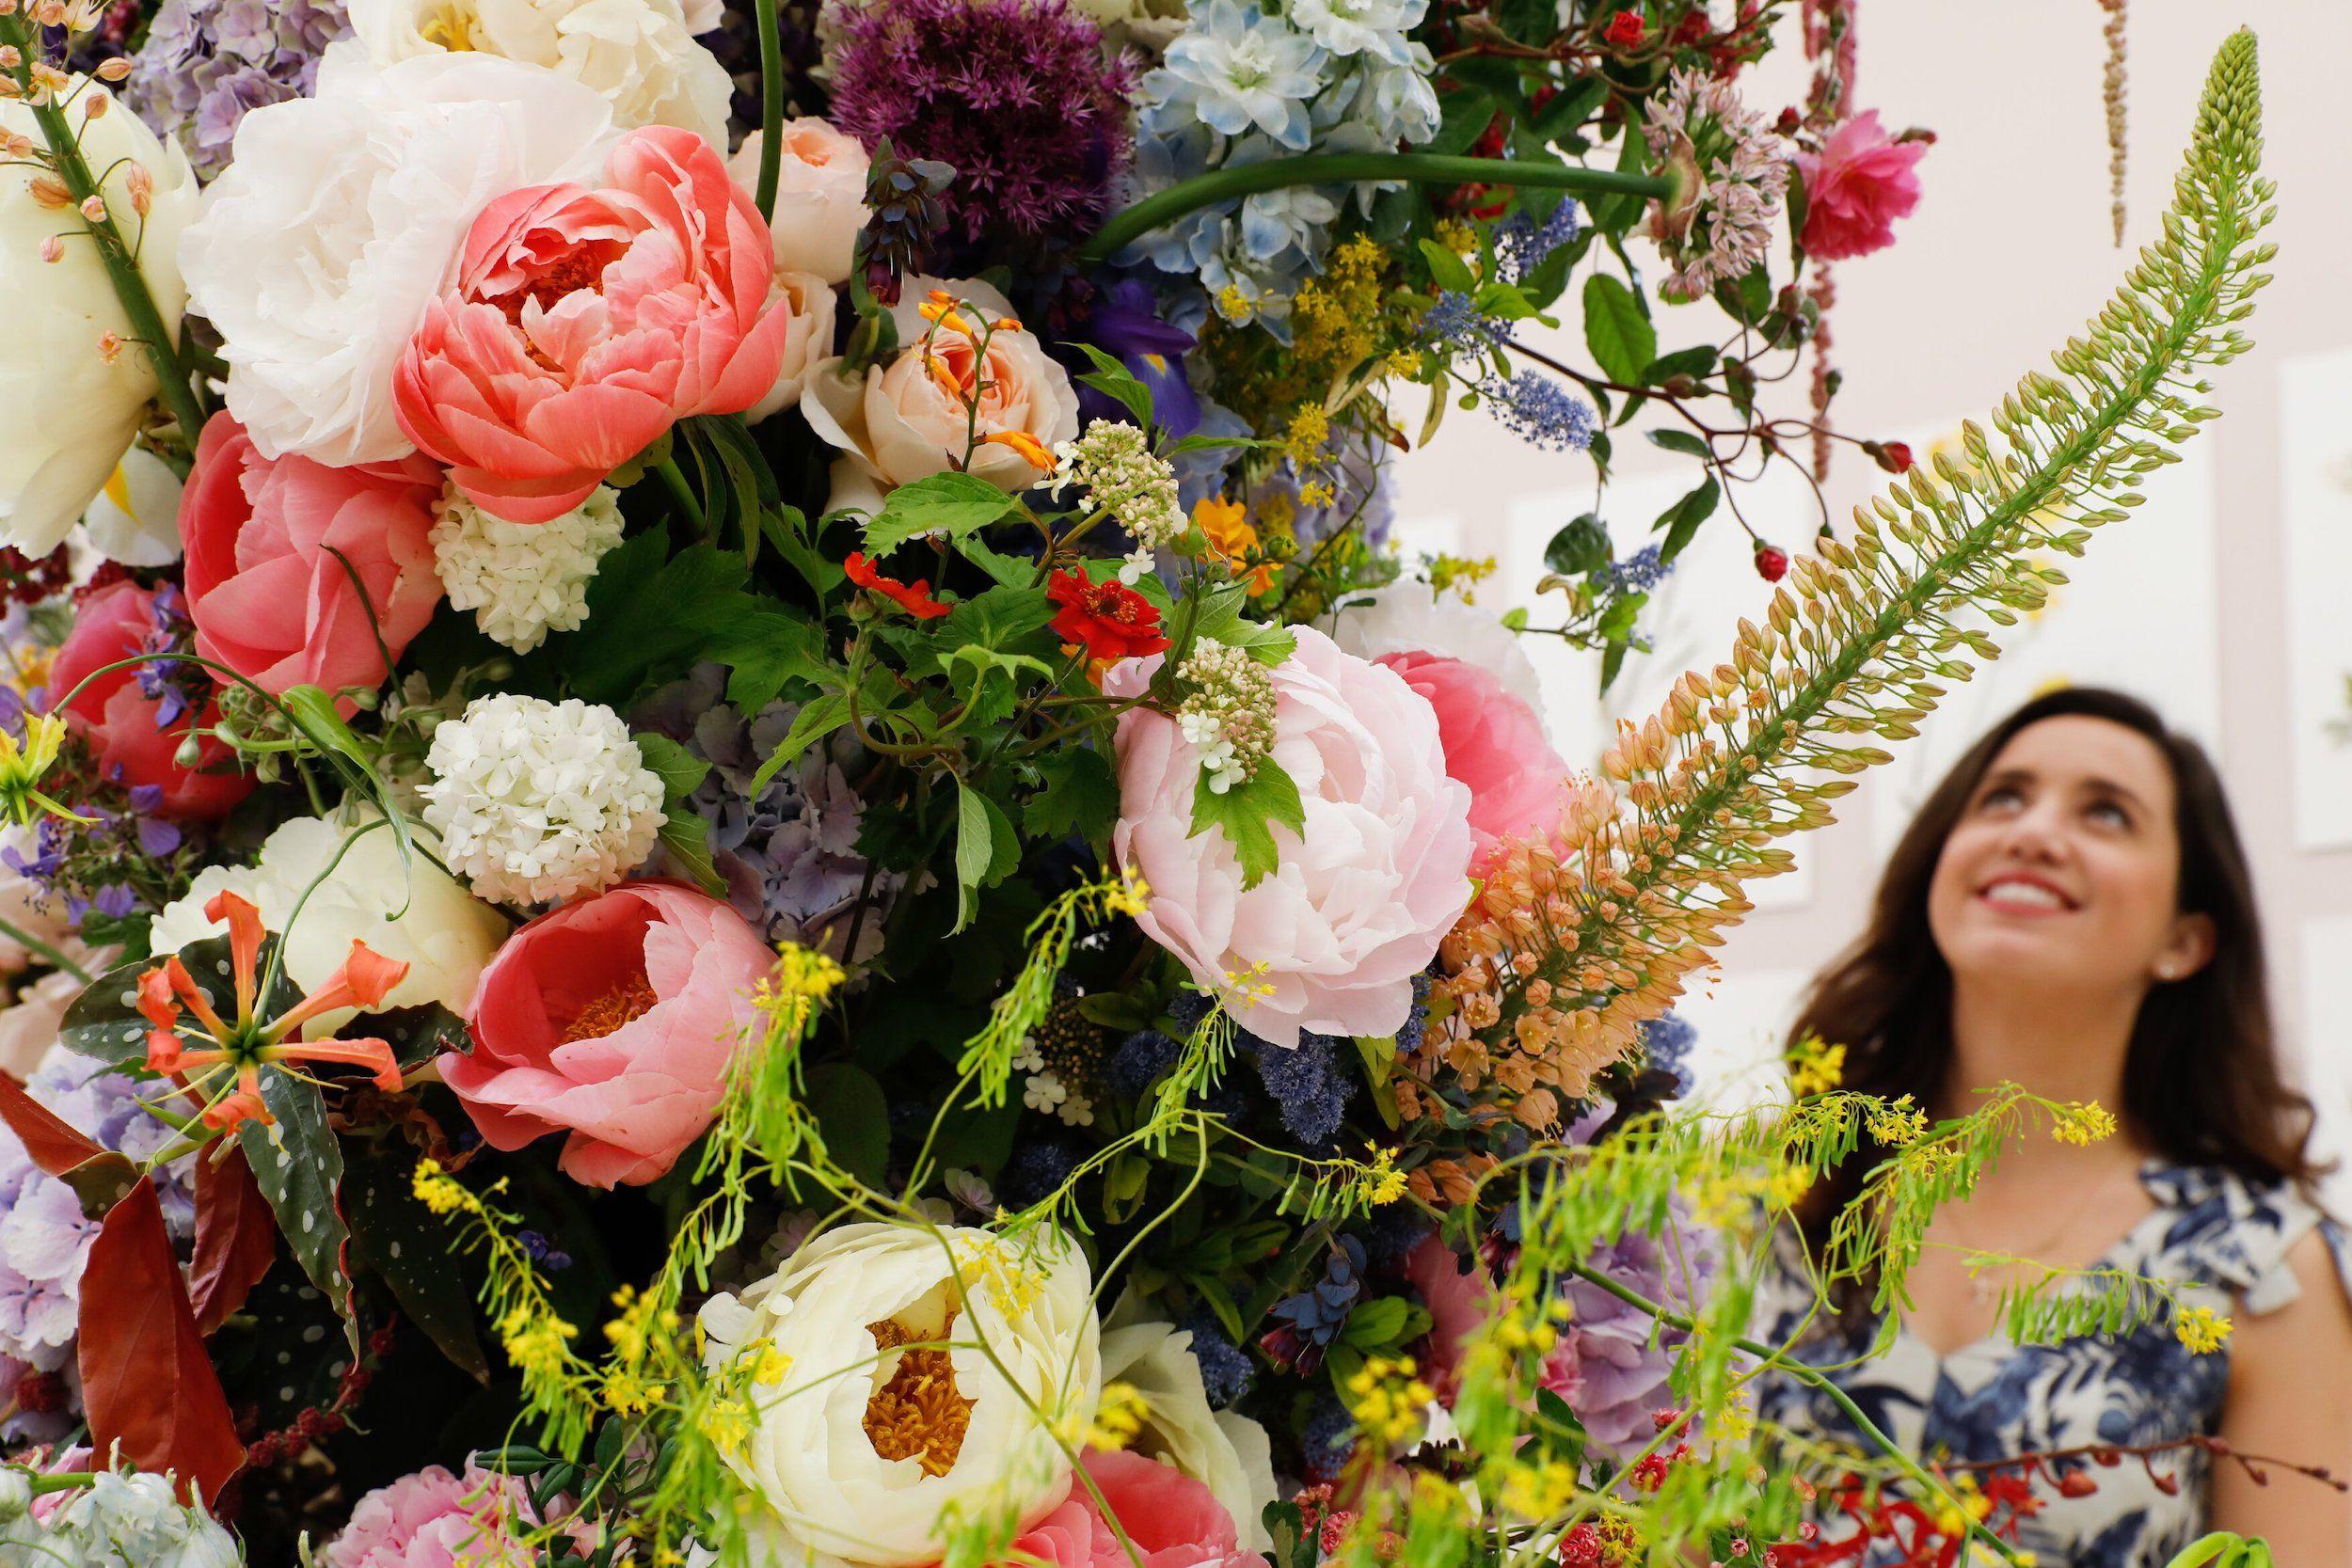 chelsea flower show 2020 virtual show